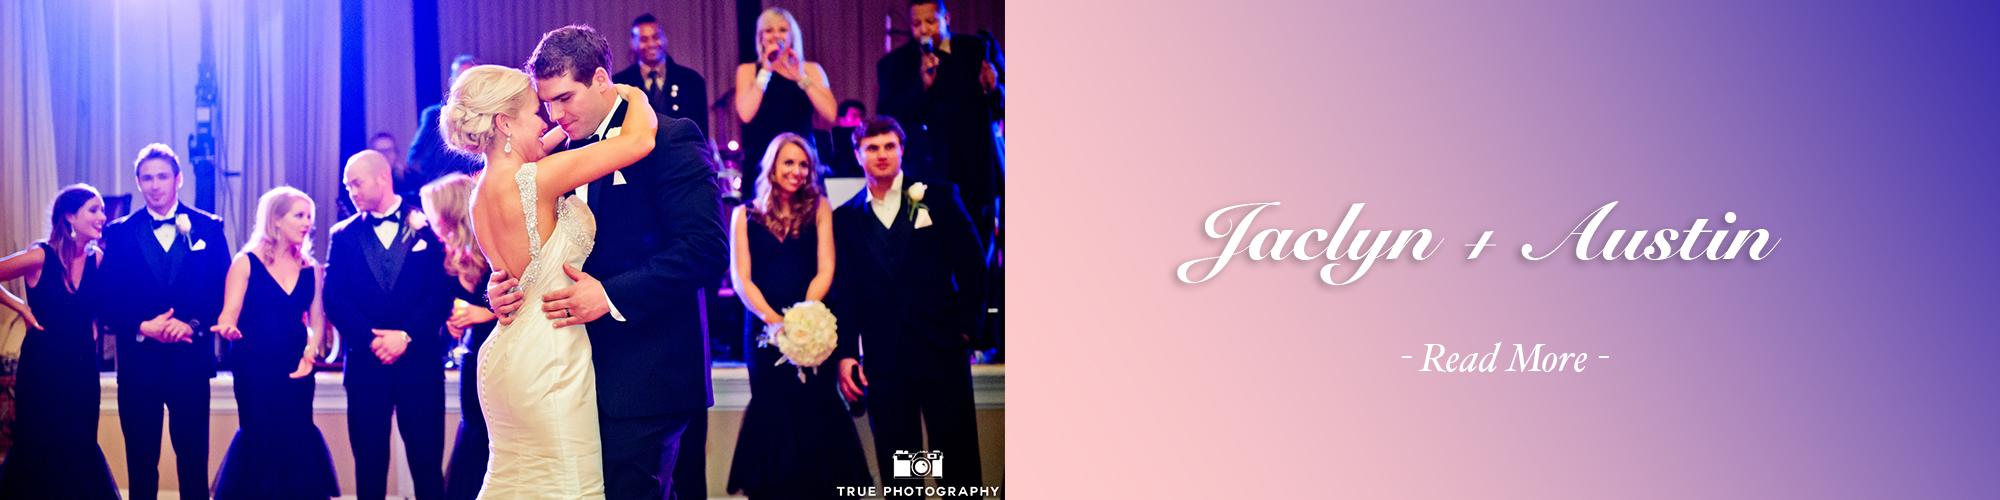 Wedding Music Jaclyn & Ausin.jpg